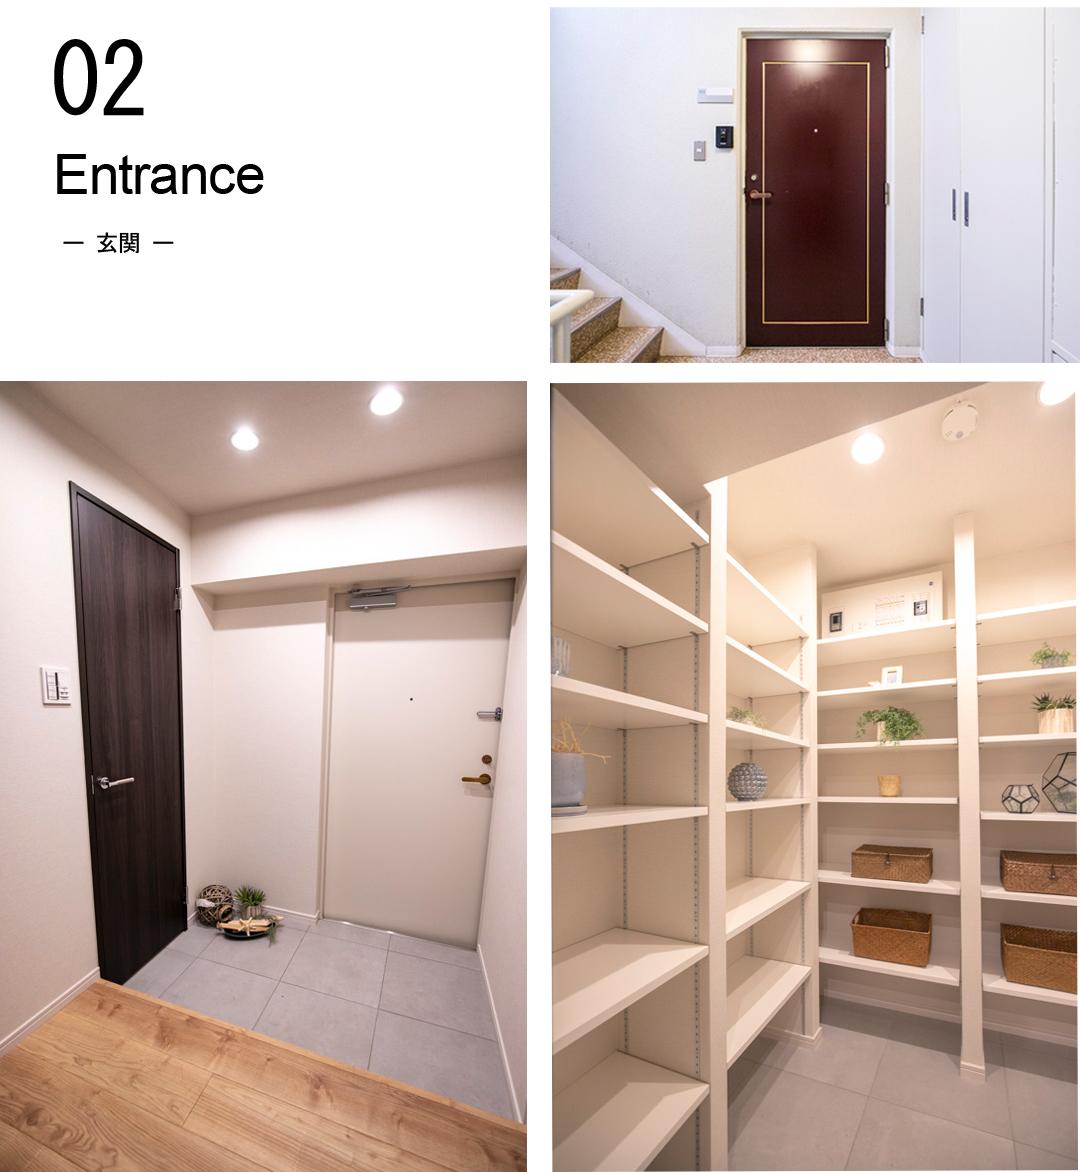 02,entrance,玄関